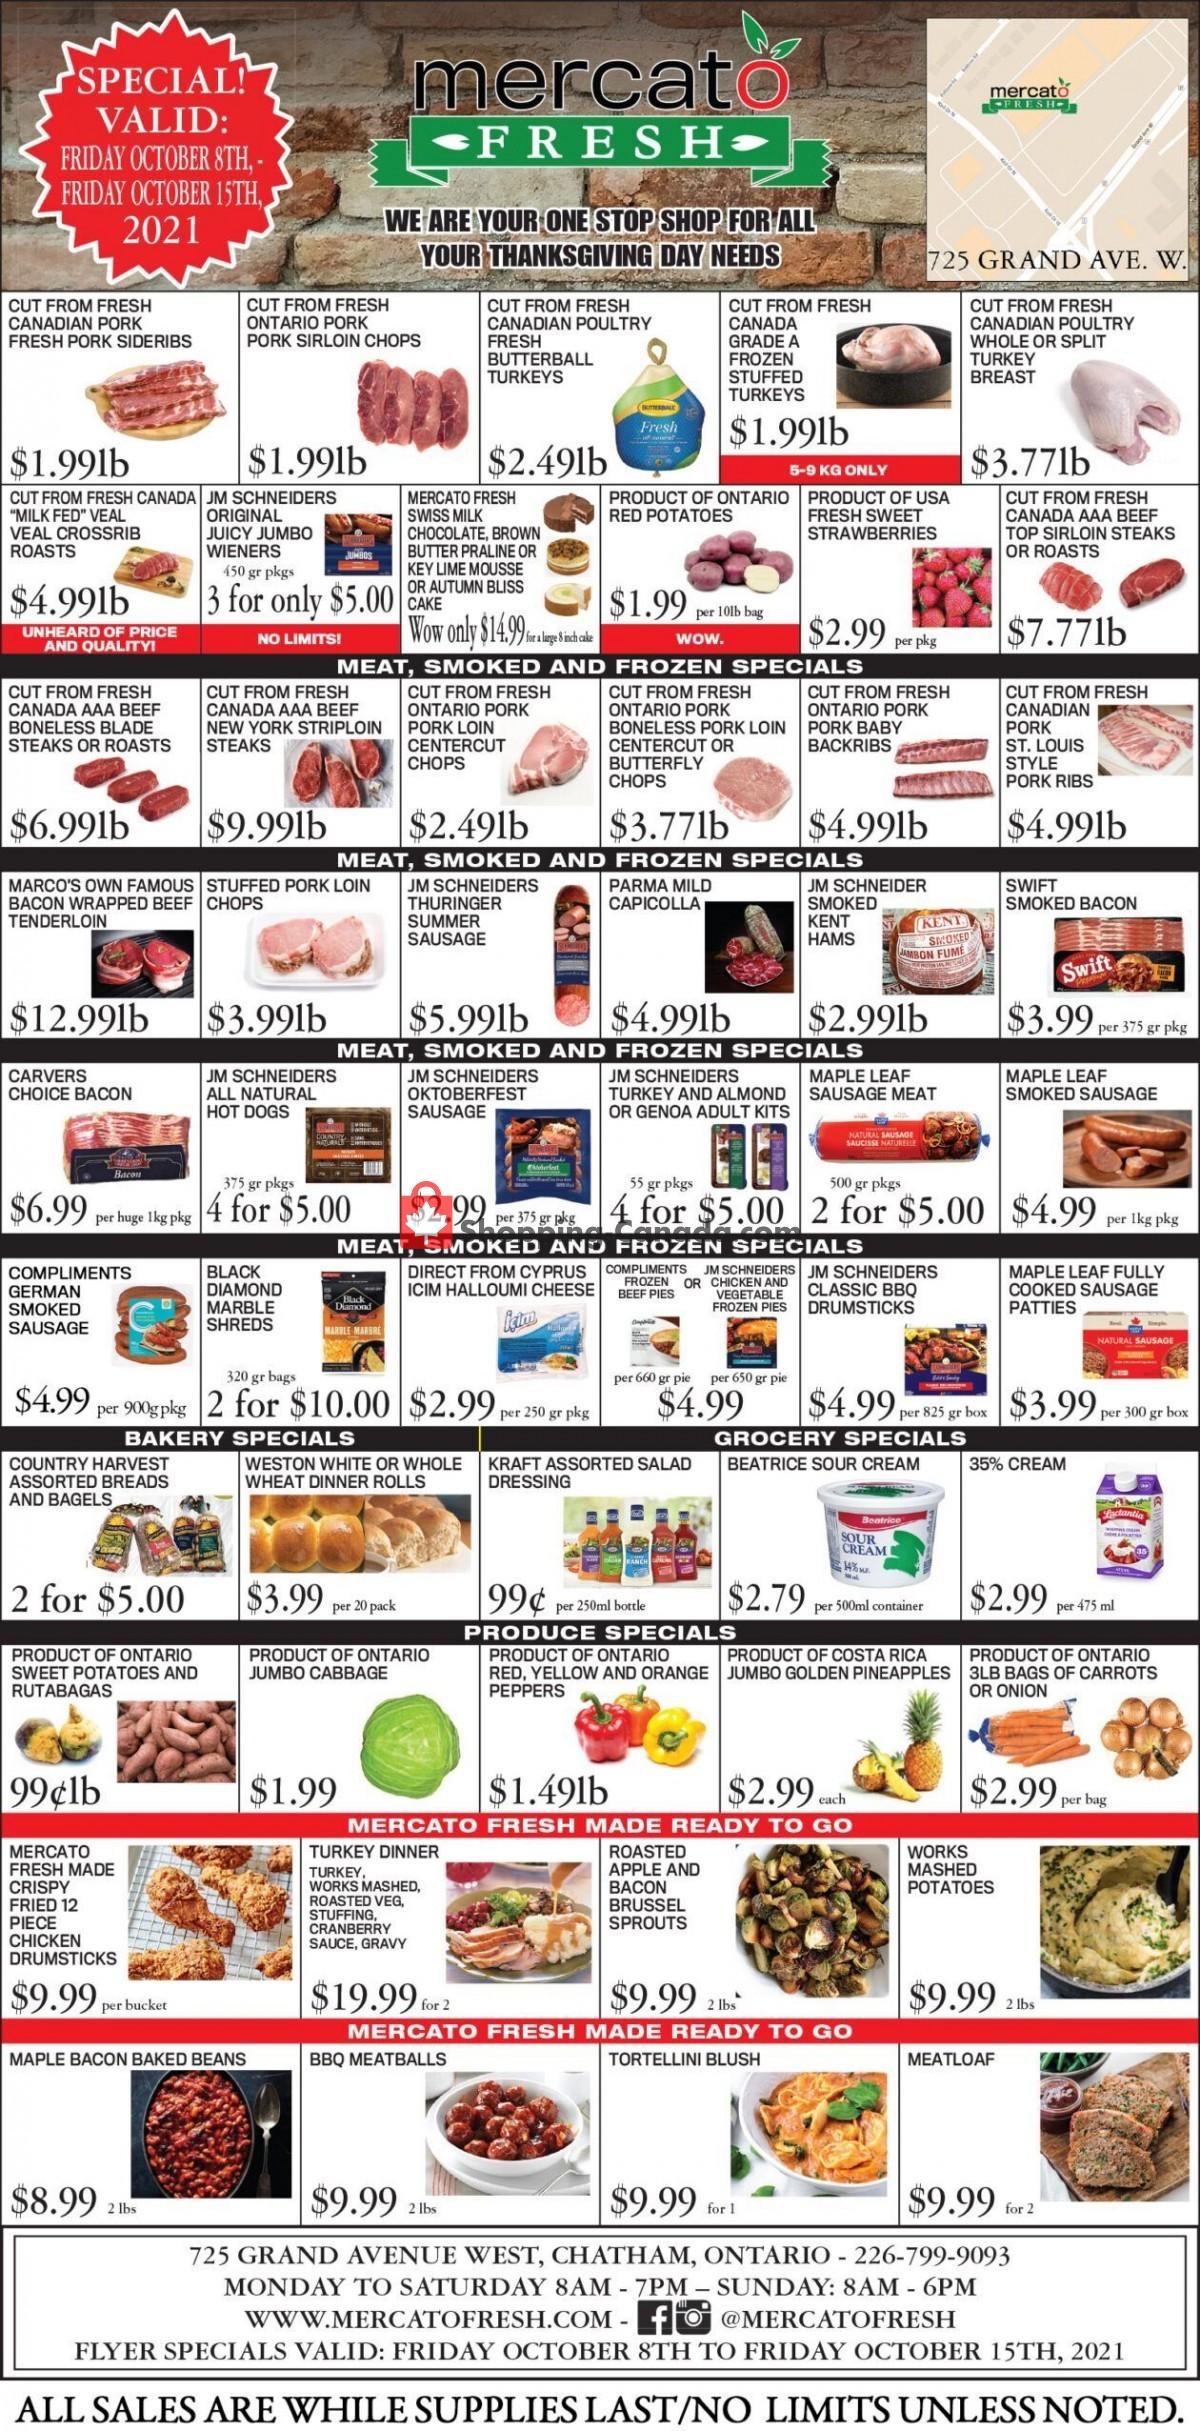 Flyer Mercato Fresh Canada - from Friday October 8, 2021 to Friday October 15, 2021